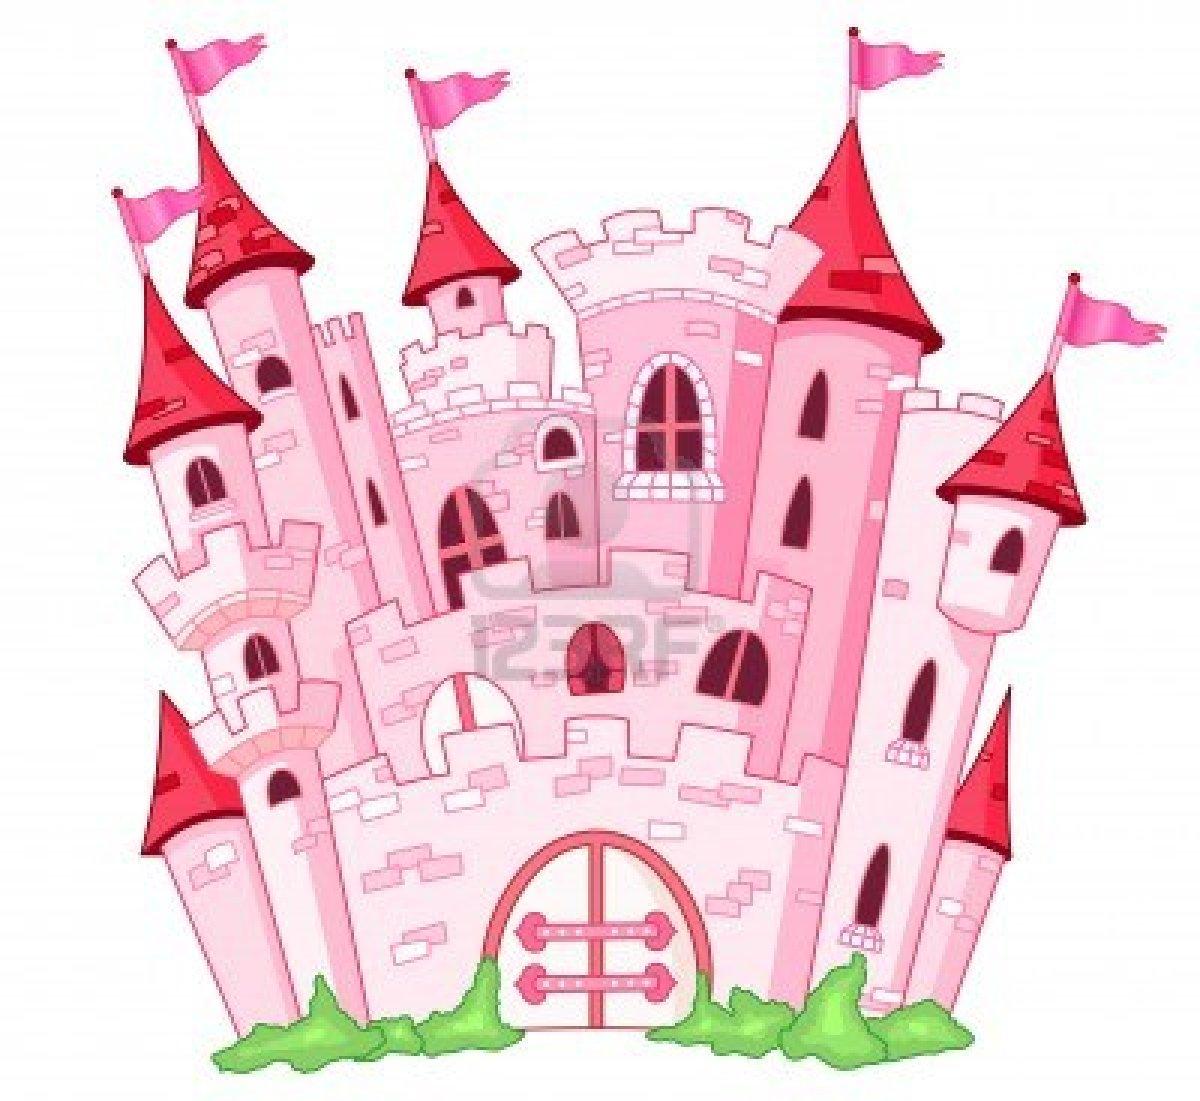 ... princess-clipart-clipart-panda-free-clipart-images-S2B9I2-clipart.jpg